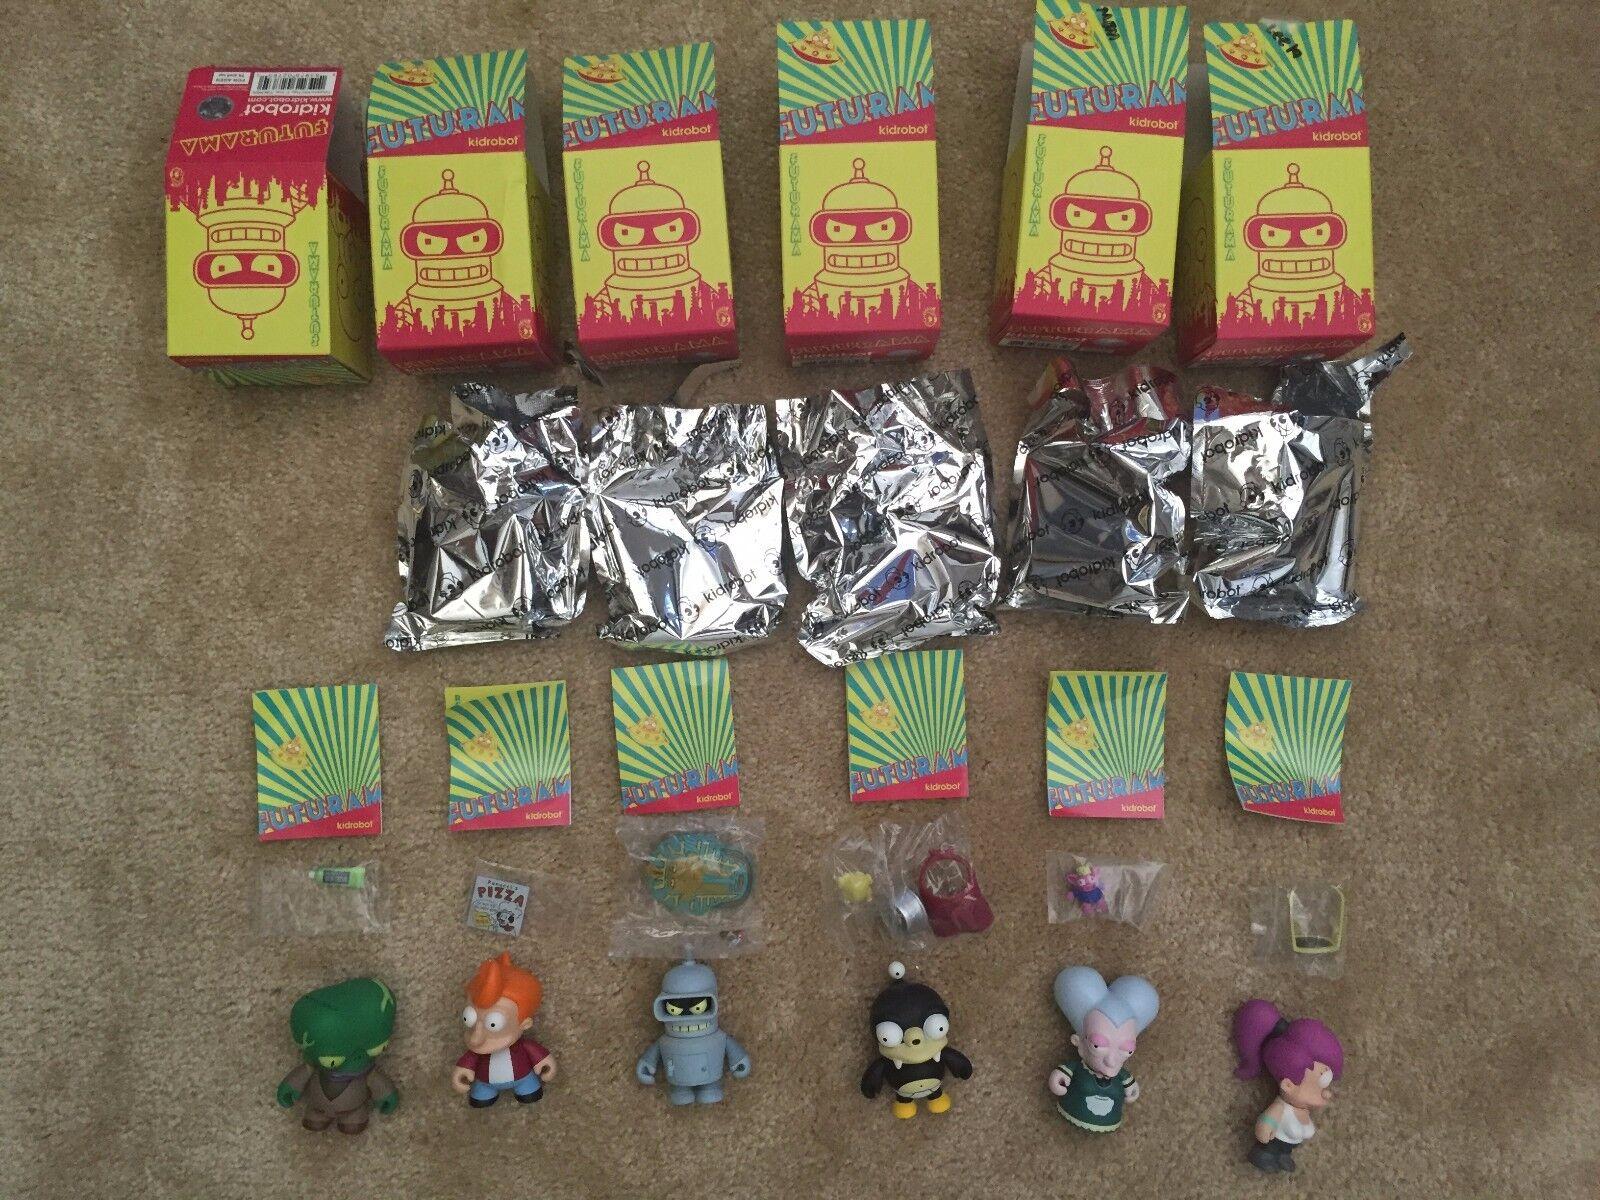 Kidrobot Futurama Series 1 Lot SIGNED BENDER, Fry, Nibbler, Leela, Mom, Morbo